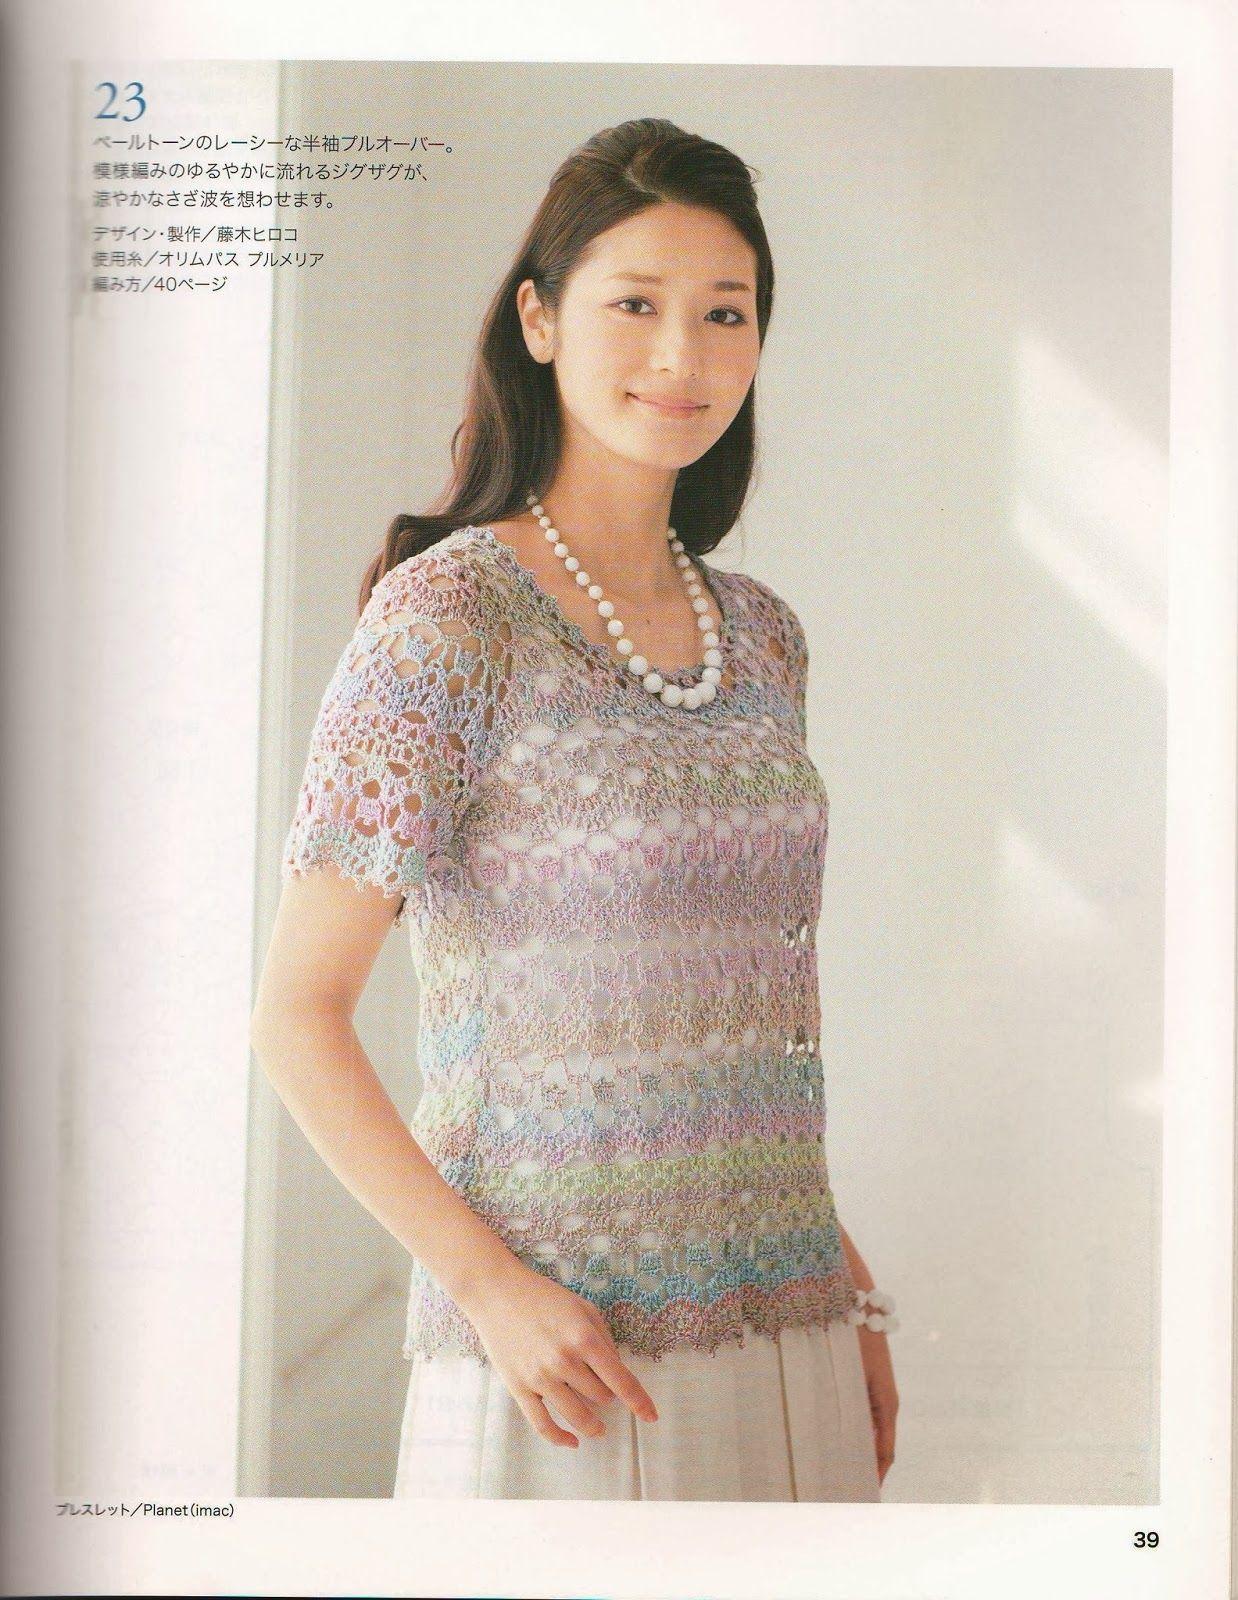 0038.JPG 1,238×1,600 pixeles | blusas a crochet | Pinterest | Tejido ...